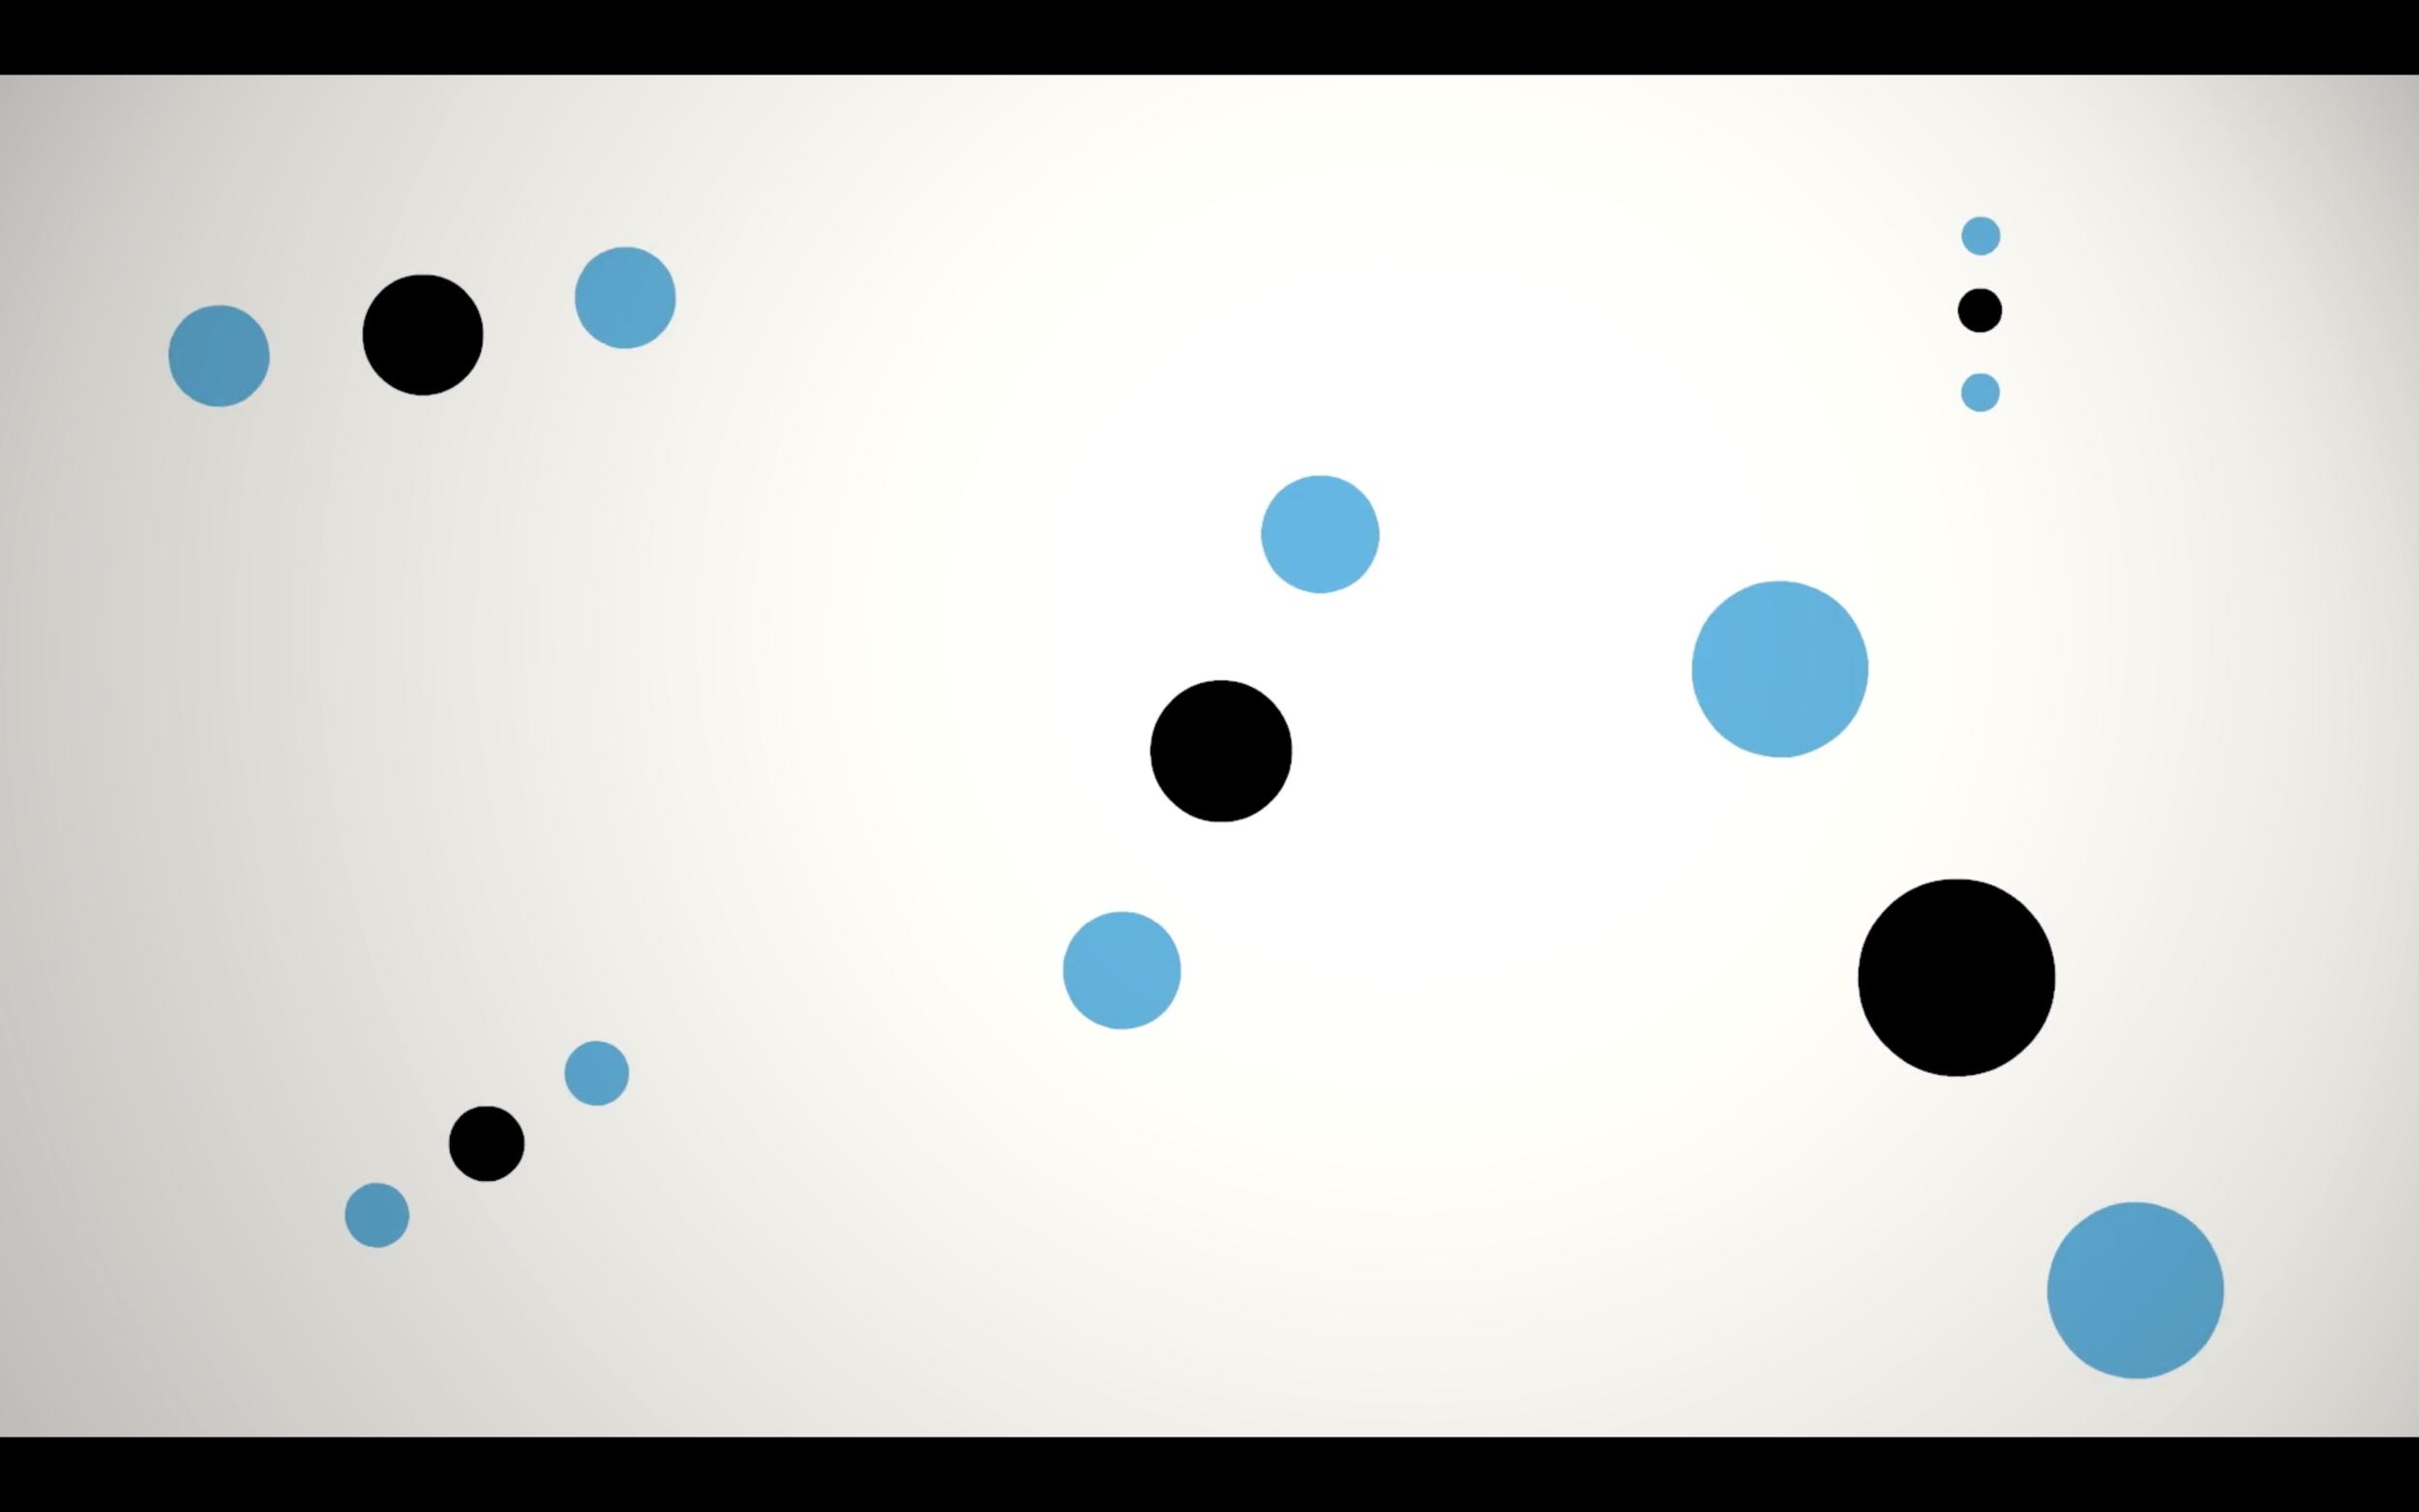 Dancing dots.png